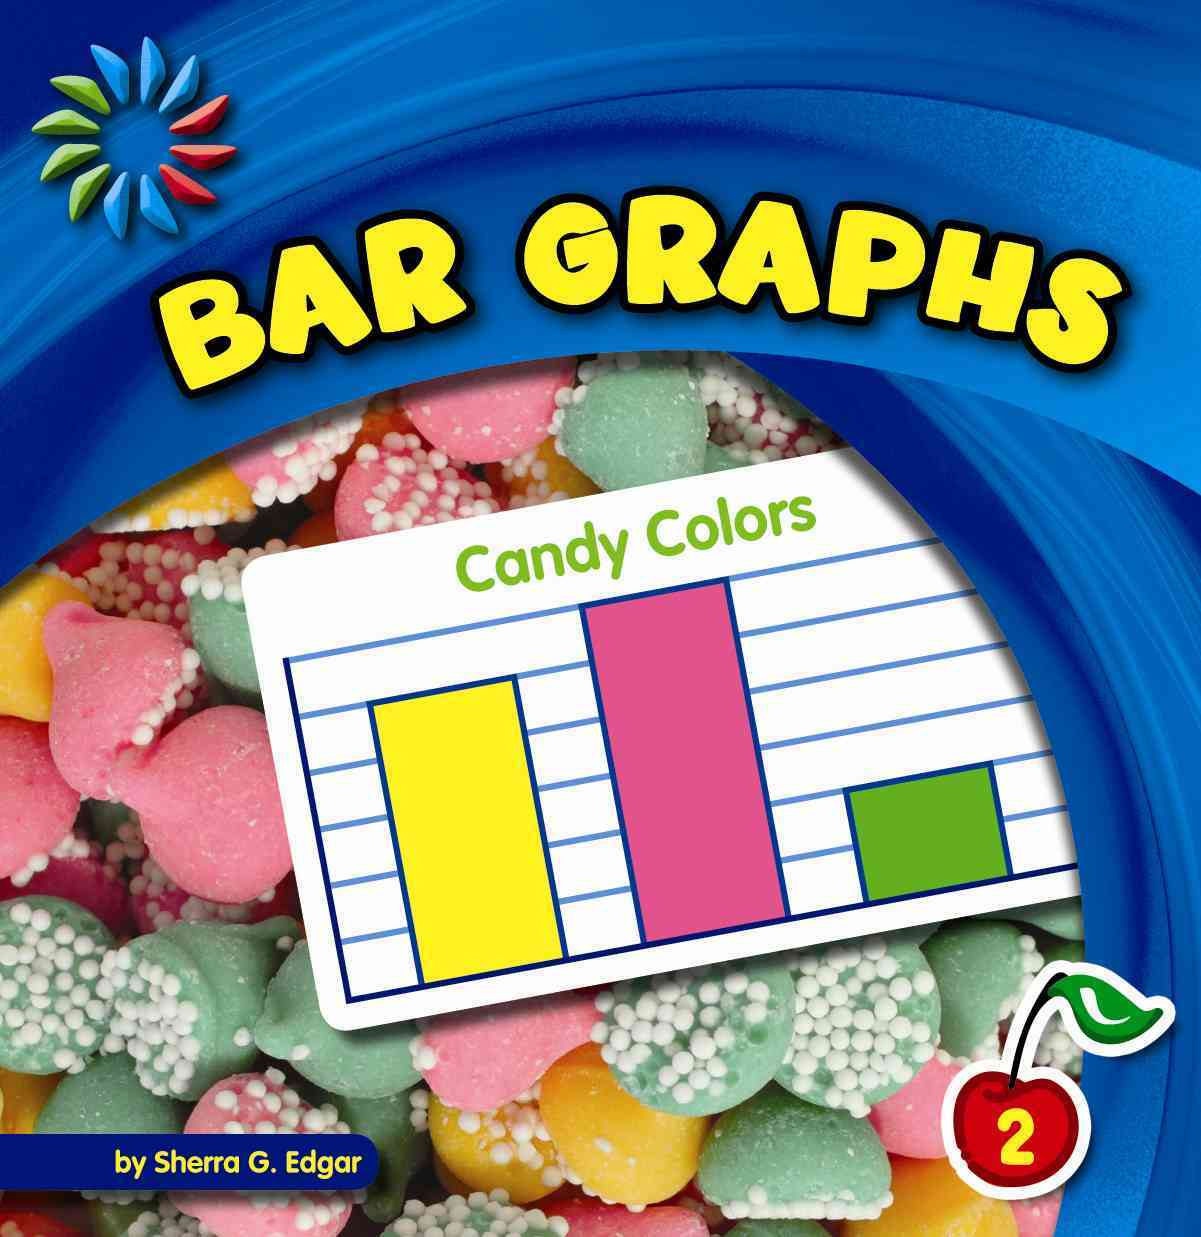 Bar Graphs By Edgar, Sherra G.